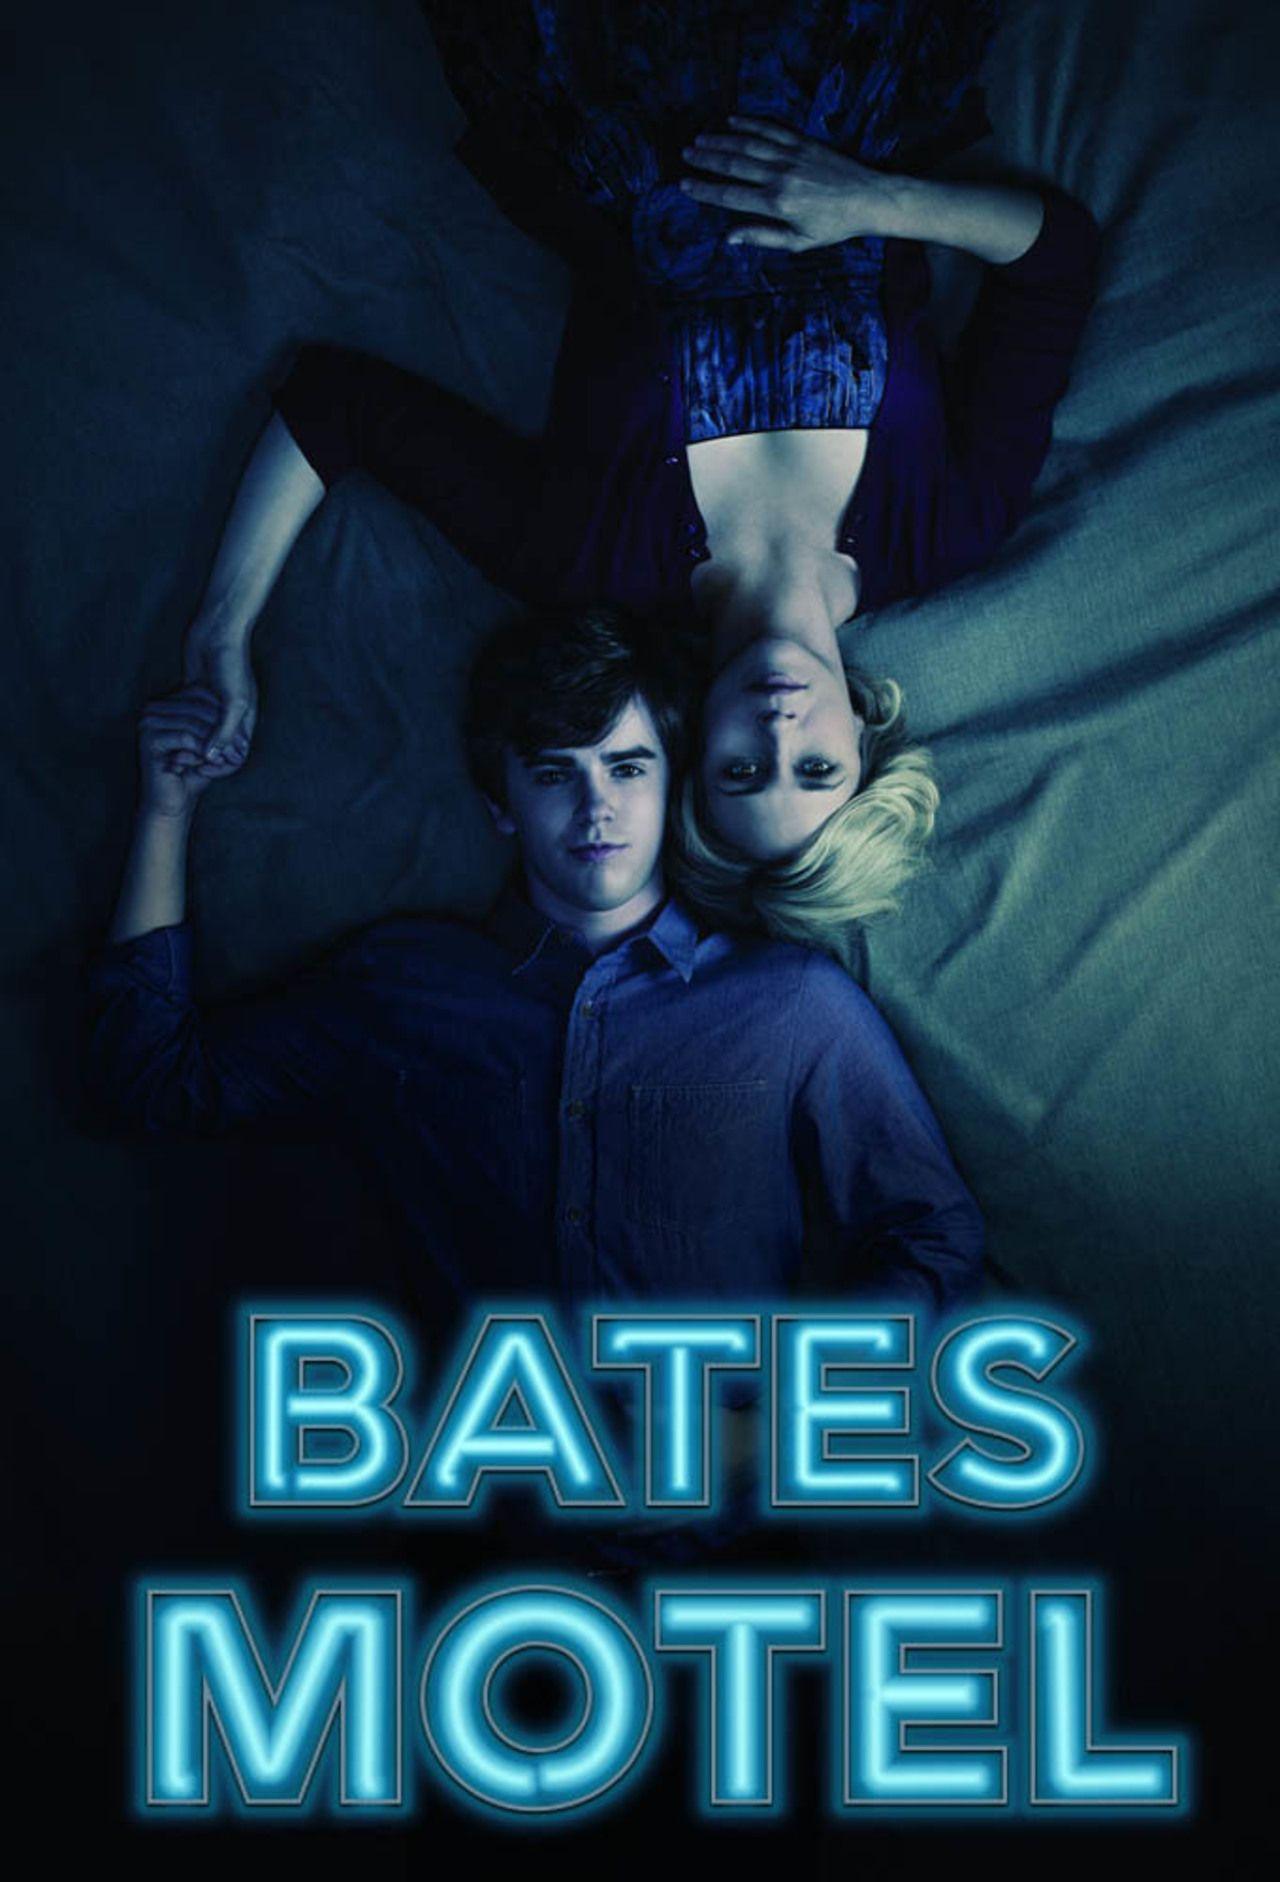 Bates Motel Wallpaper Google Search Bates Motel Film Film